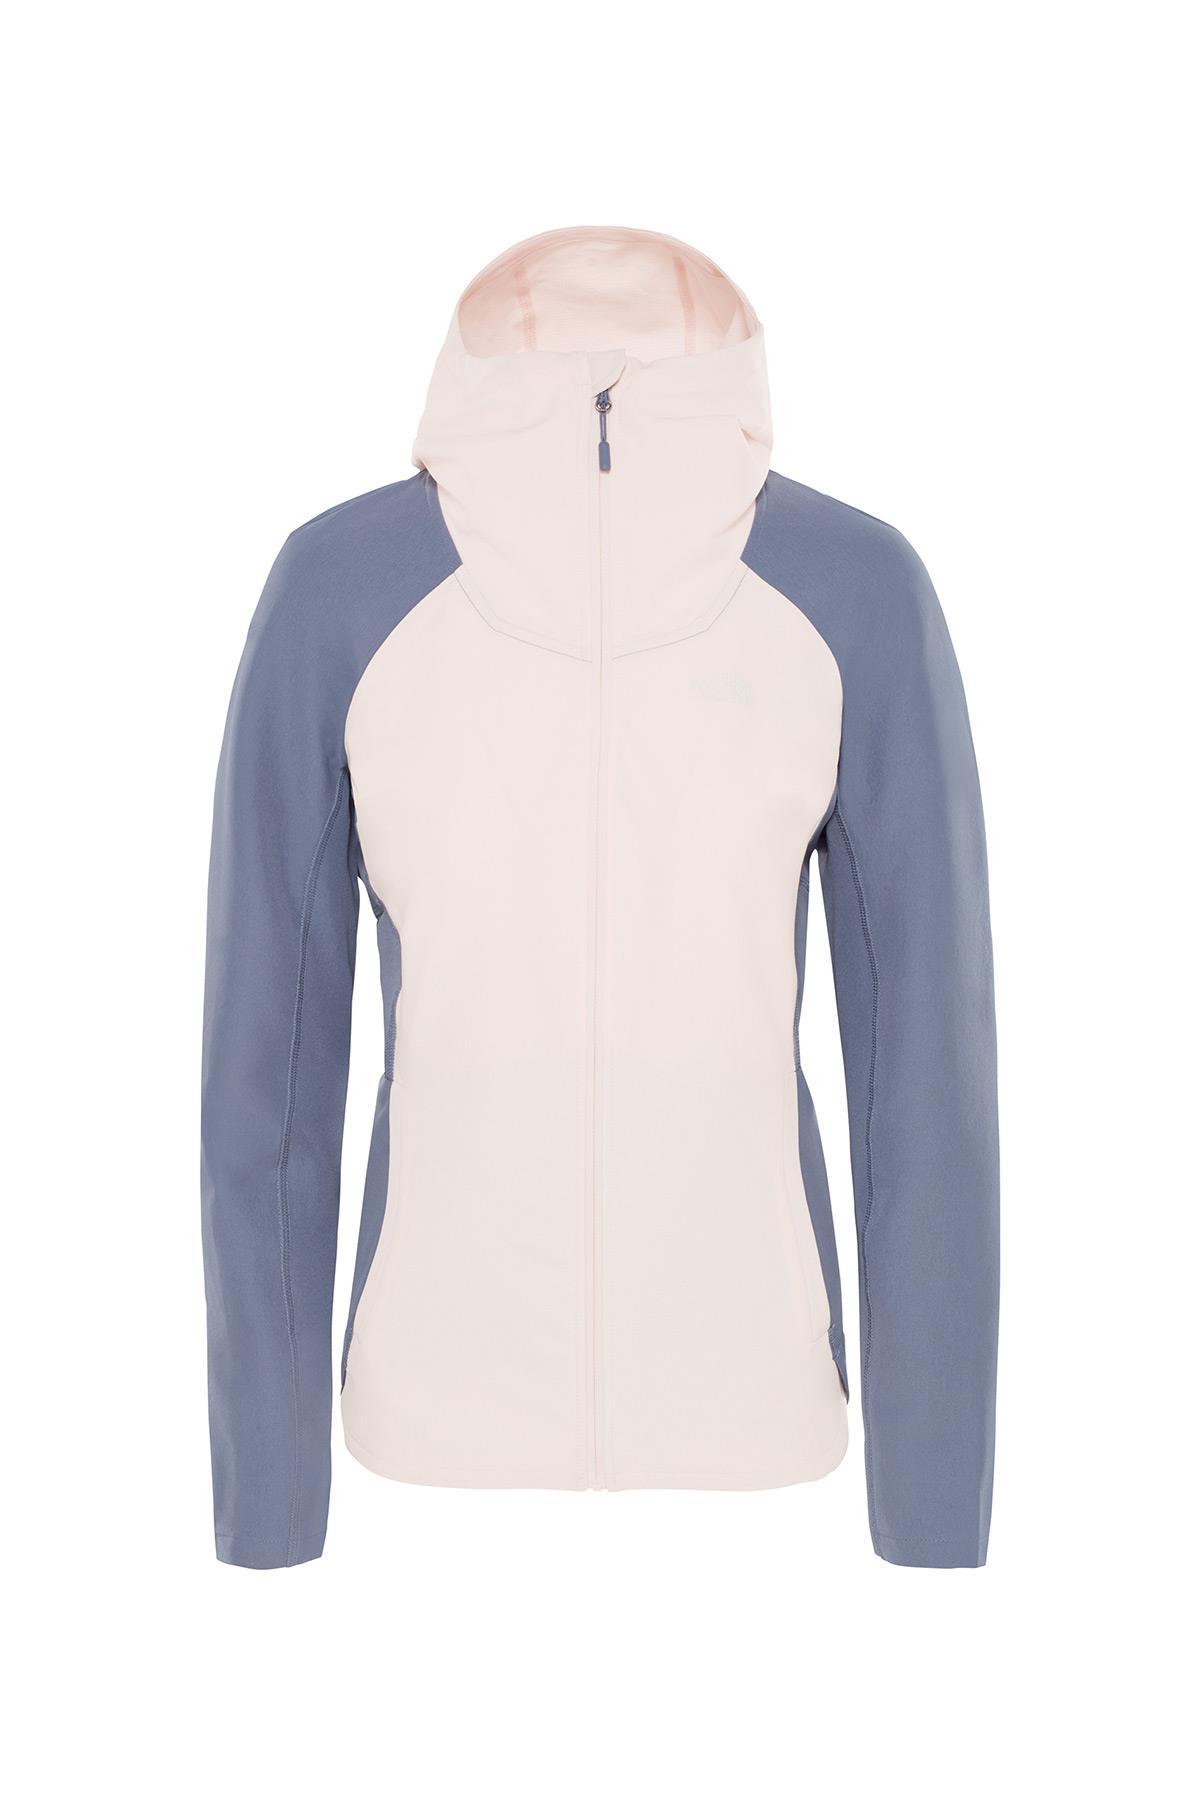 The Northface Kadın İnvene Softshell Jacket T93Ry3B98 Ceket